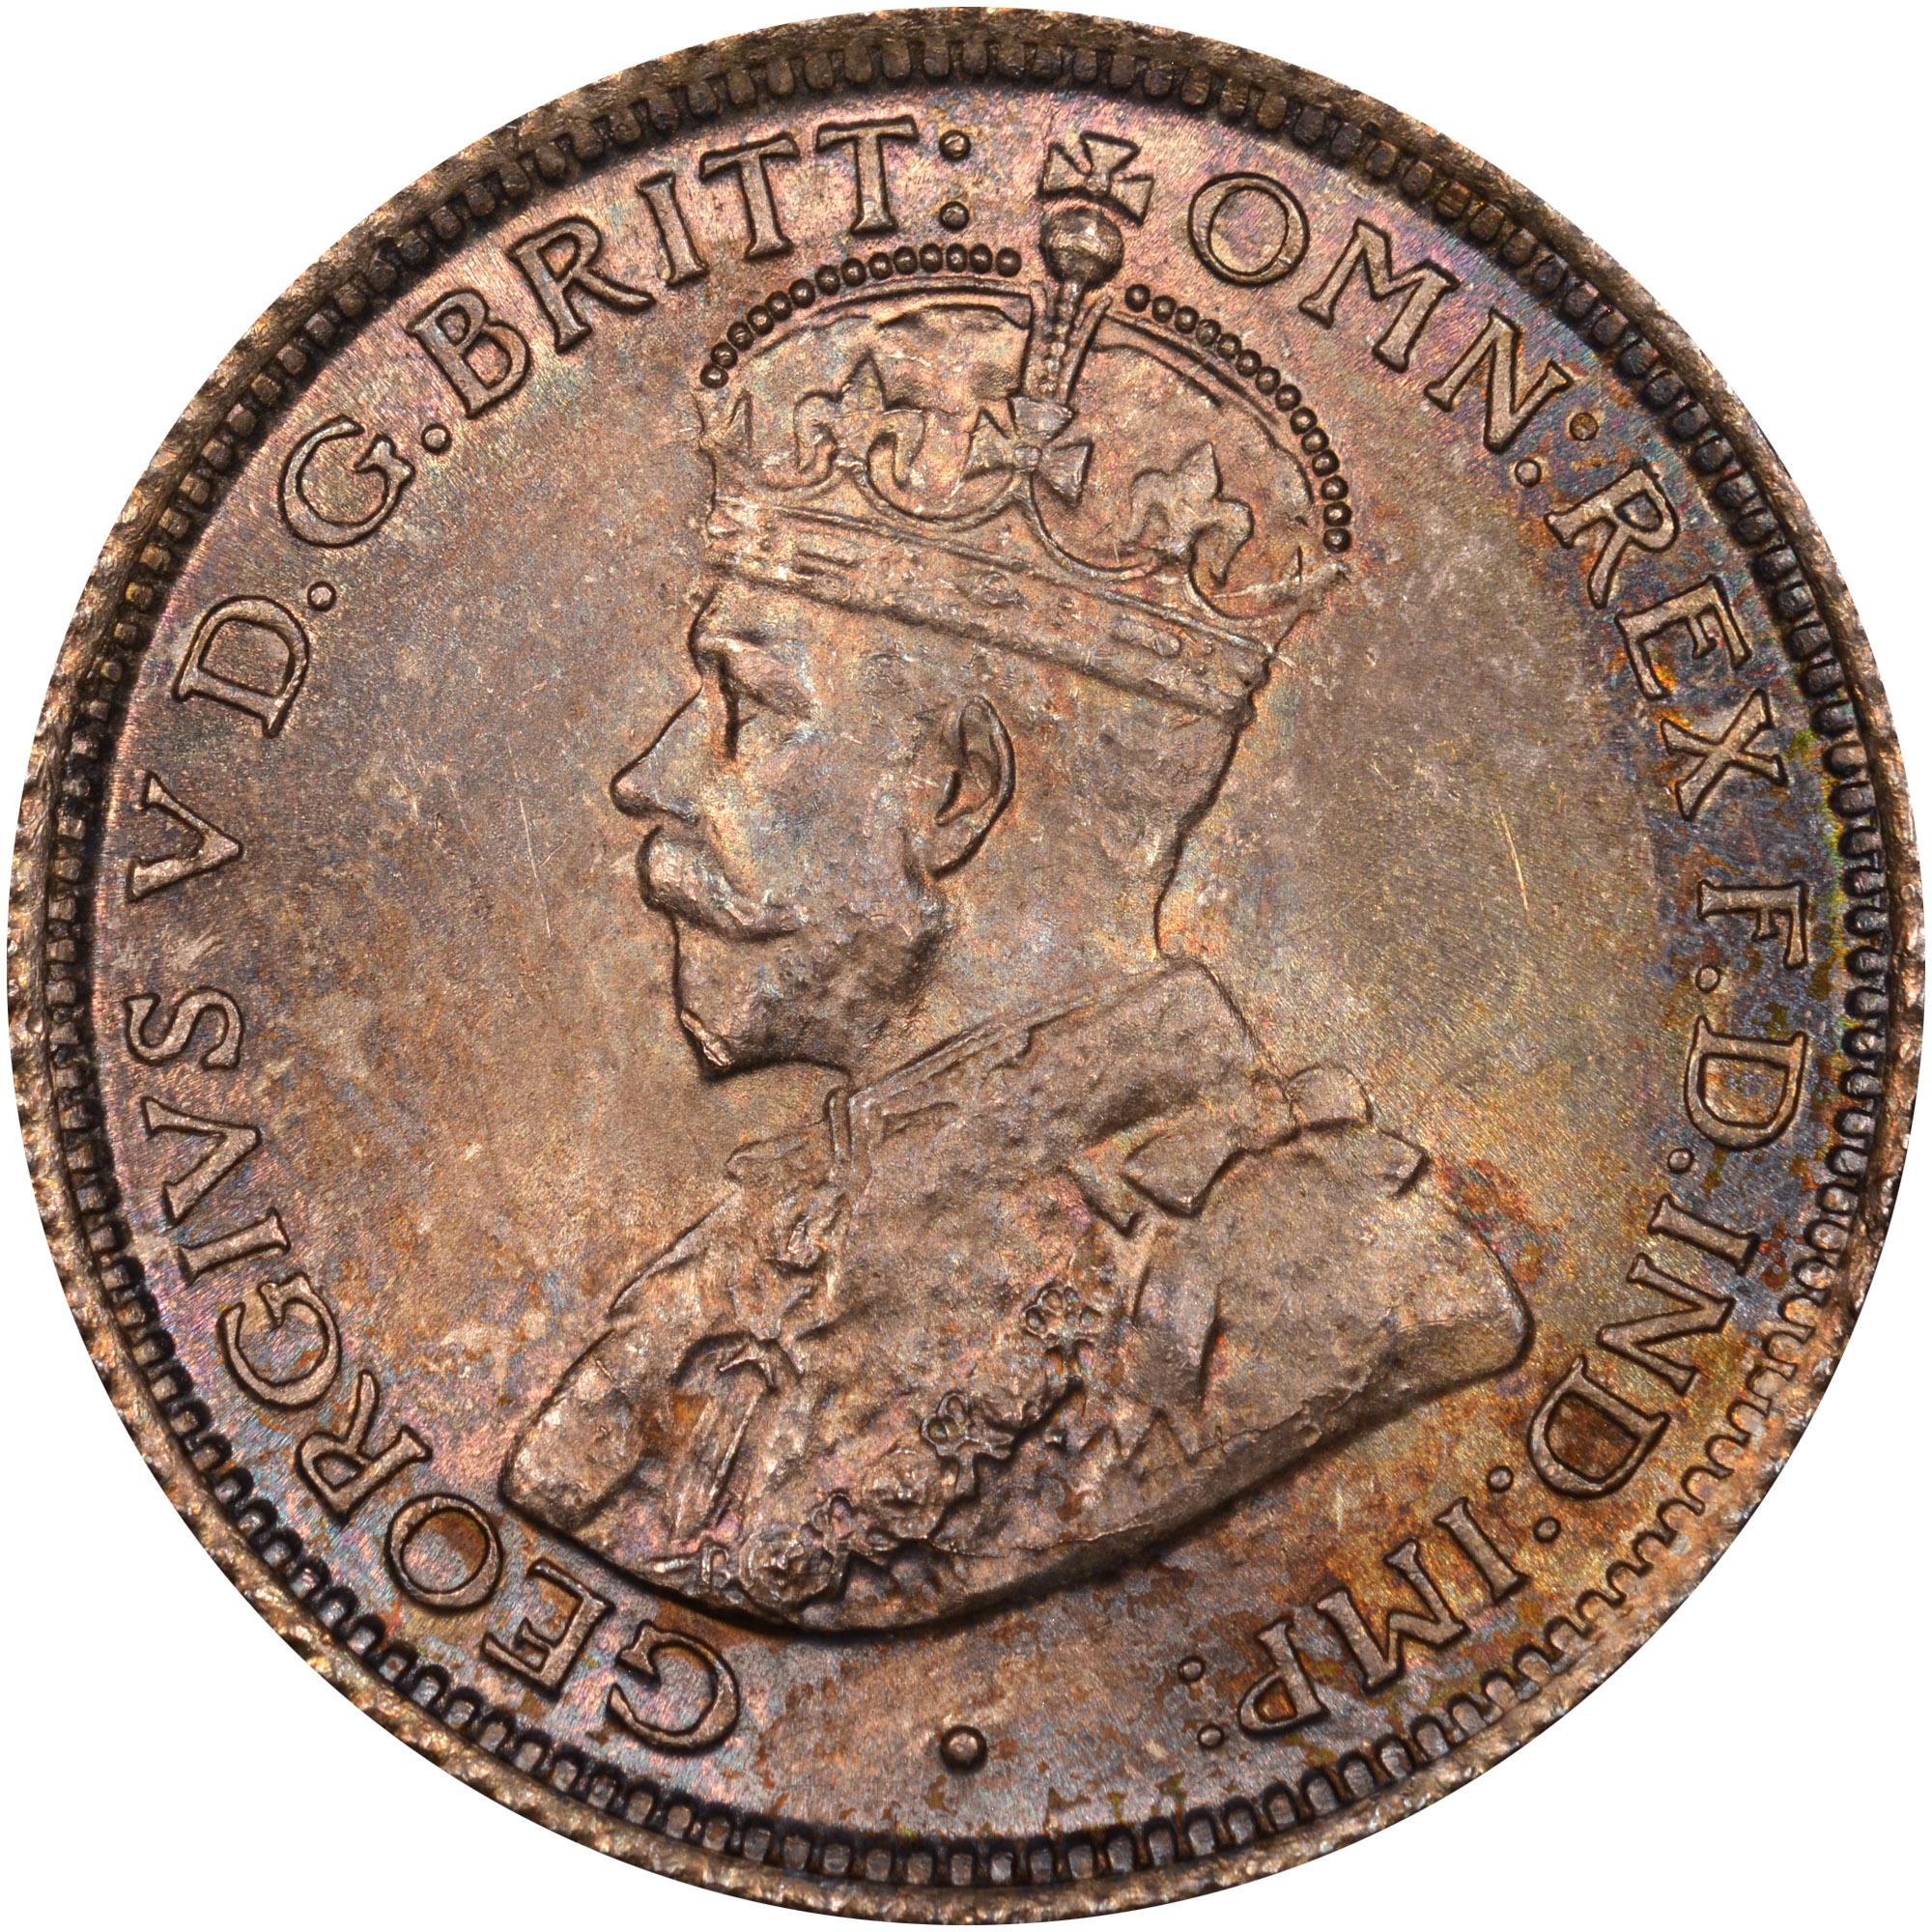 1913-1919 British West Africa 6 Pence obverse